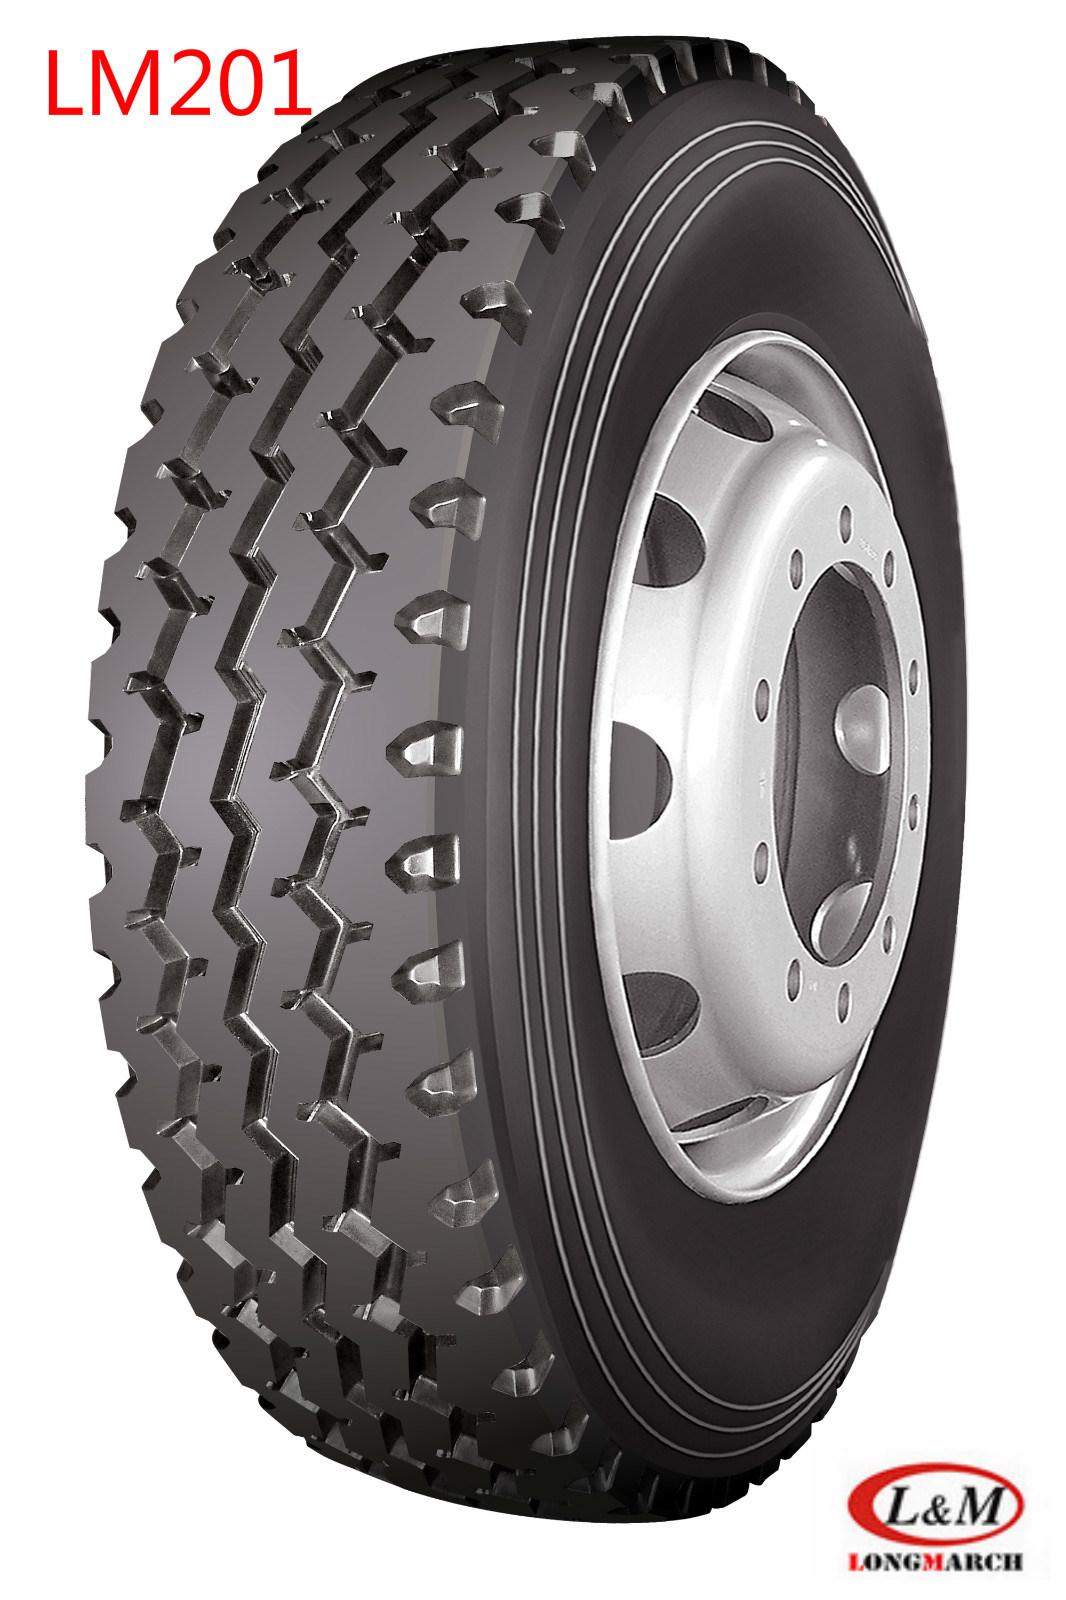 Longmarch TBR Heavy Duty All Position Radial Truck Tire (LM201)